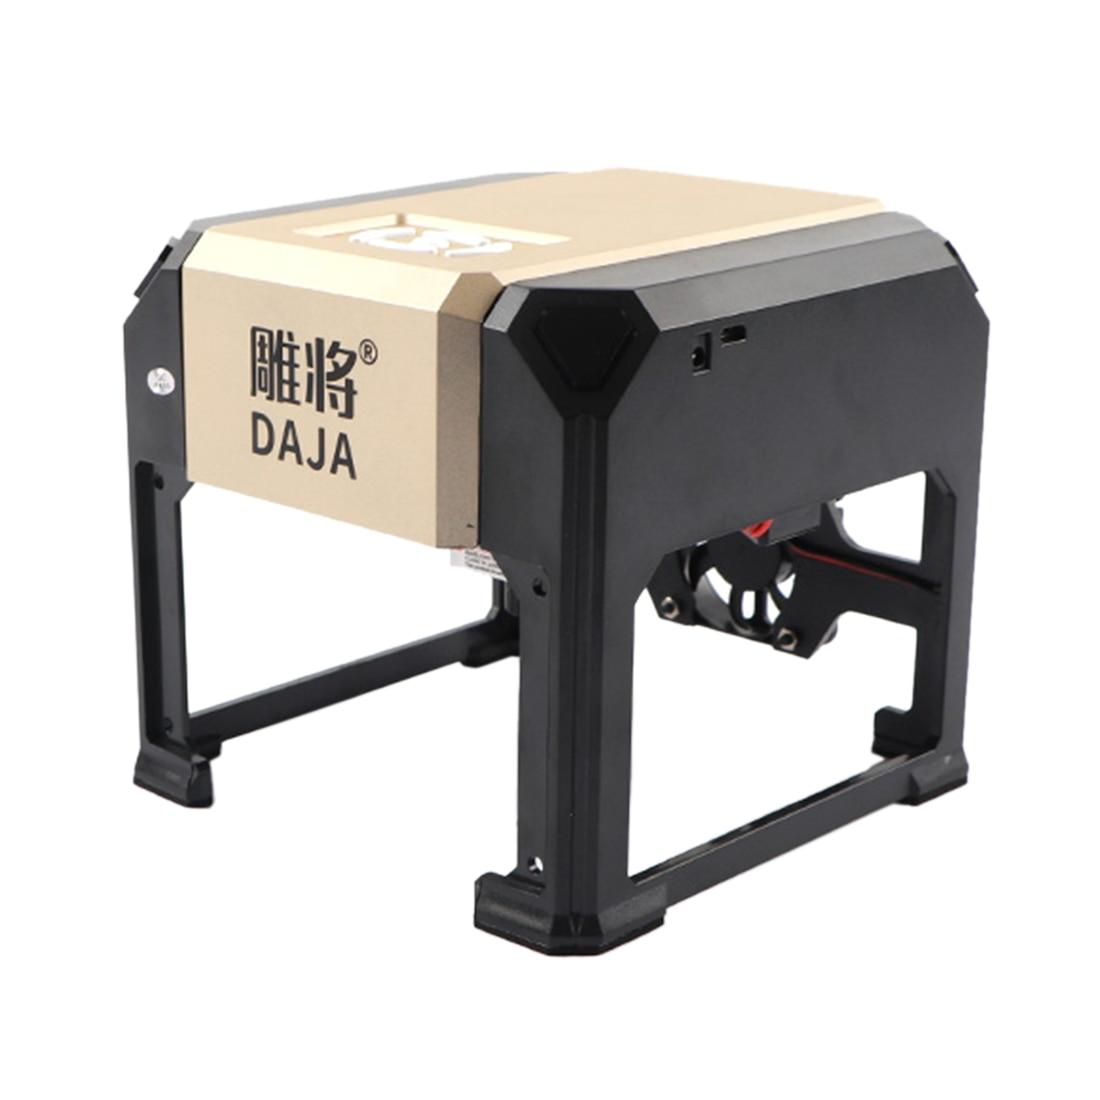 K5 3000mW DIY Mini Laser Engraver Mark Printer Laser Engraving Machine Education Christmas Birthday Gift-UK Plug/US Plug/EU Plug